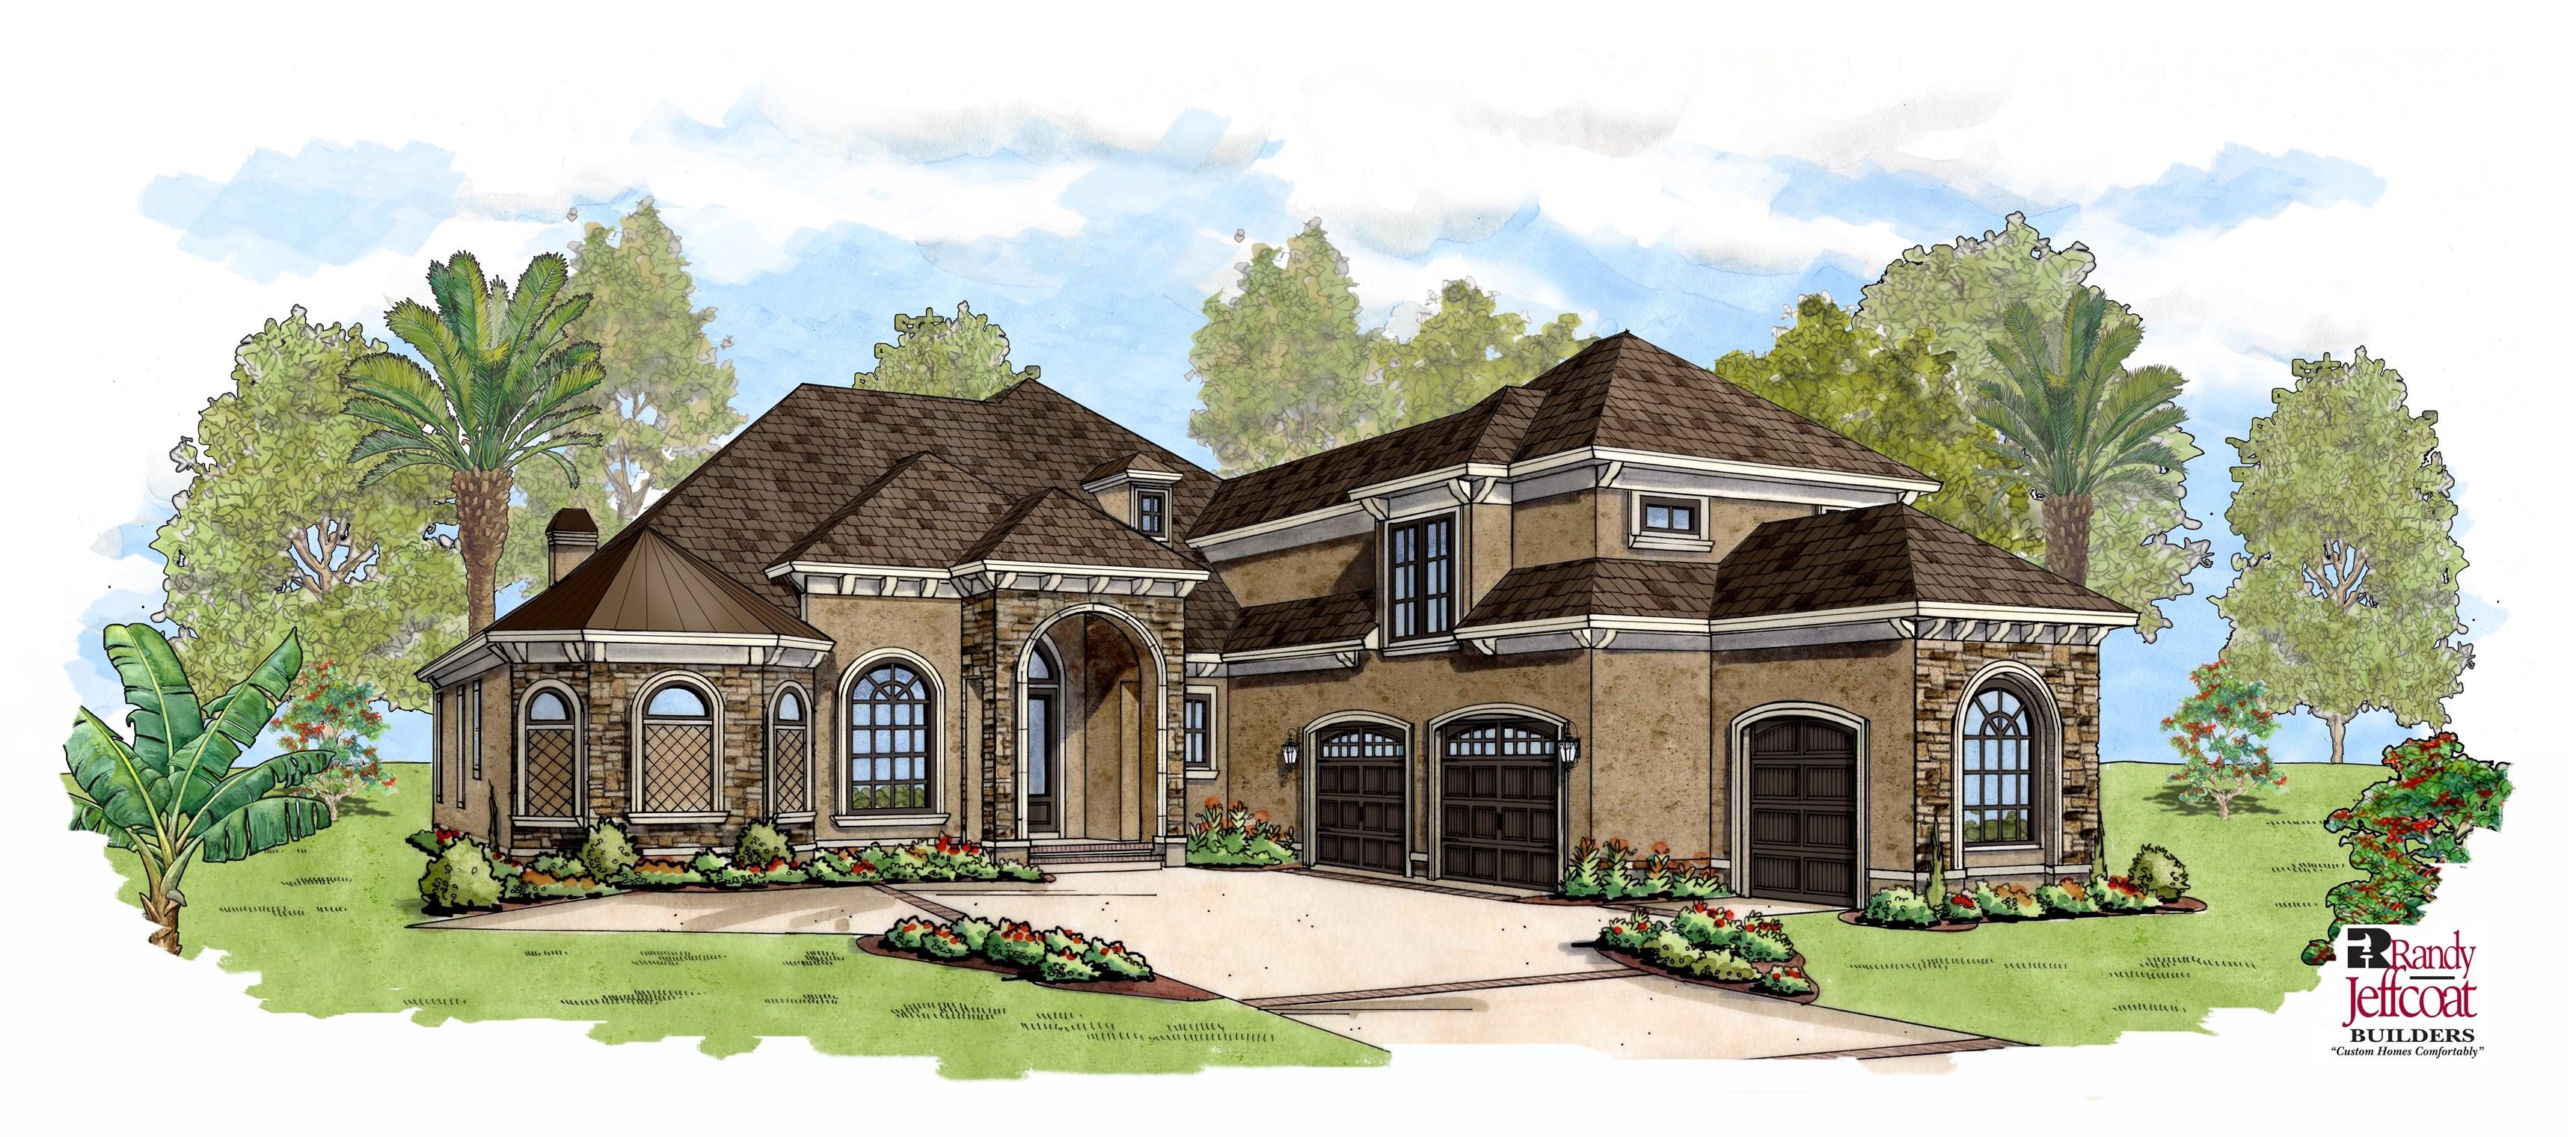 Custom lake home designs freshouz 28 images minnesota for Stephen davis home designs